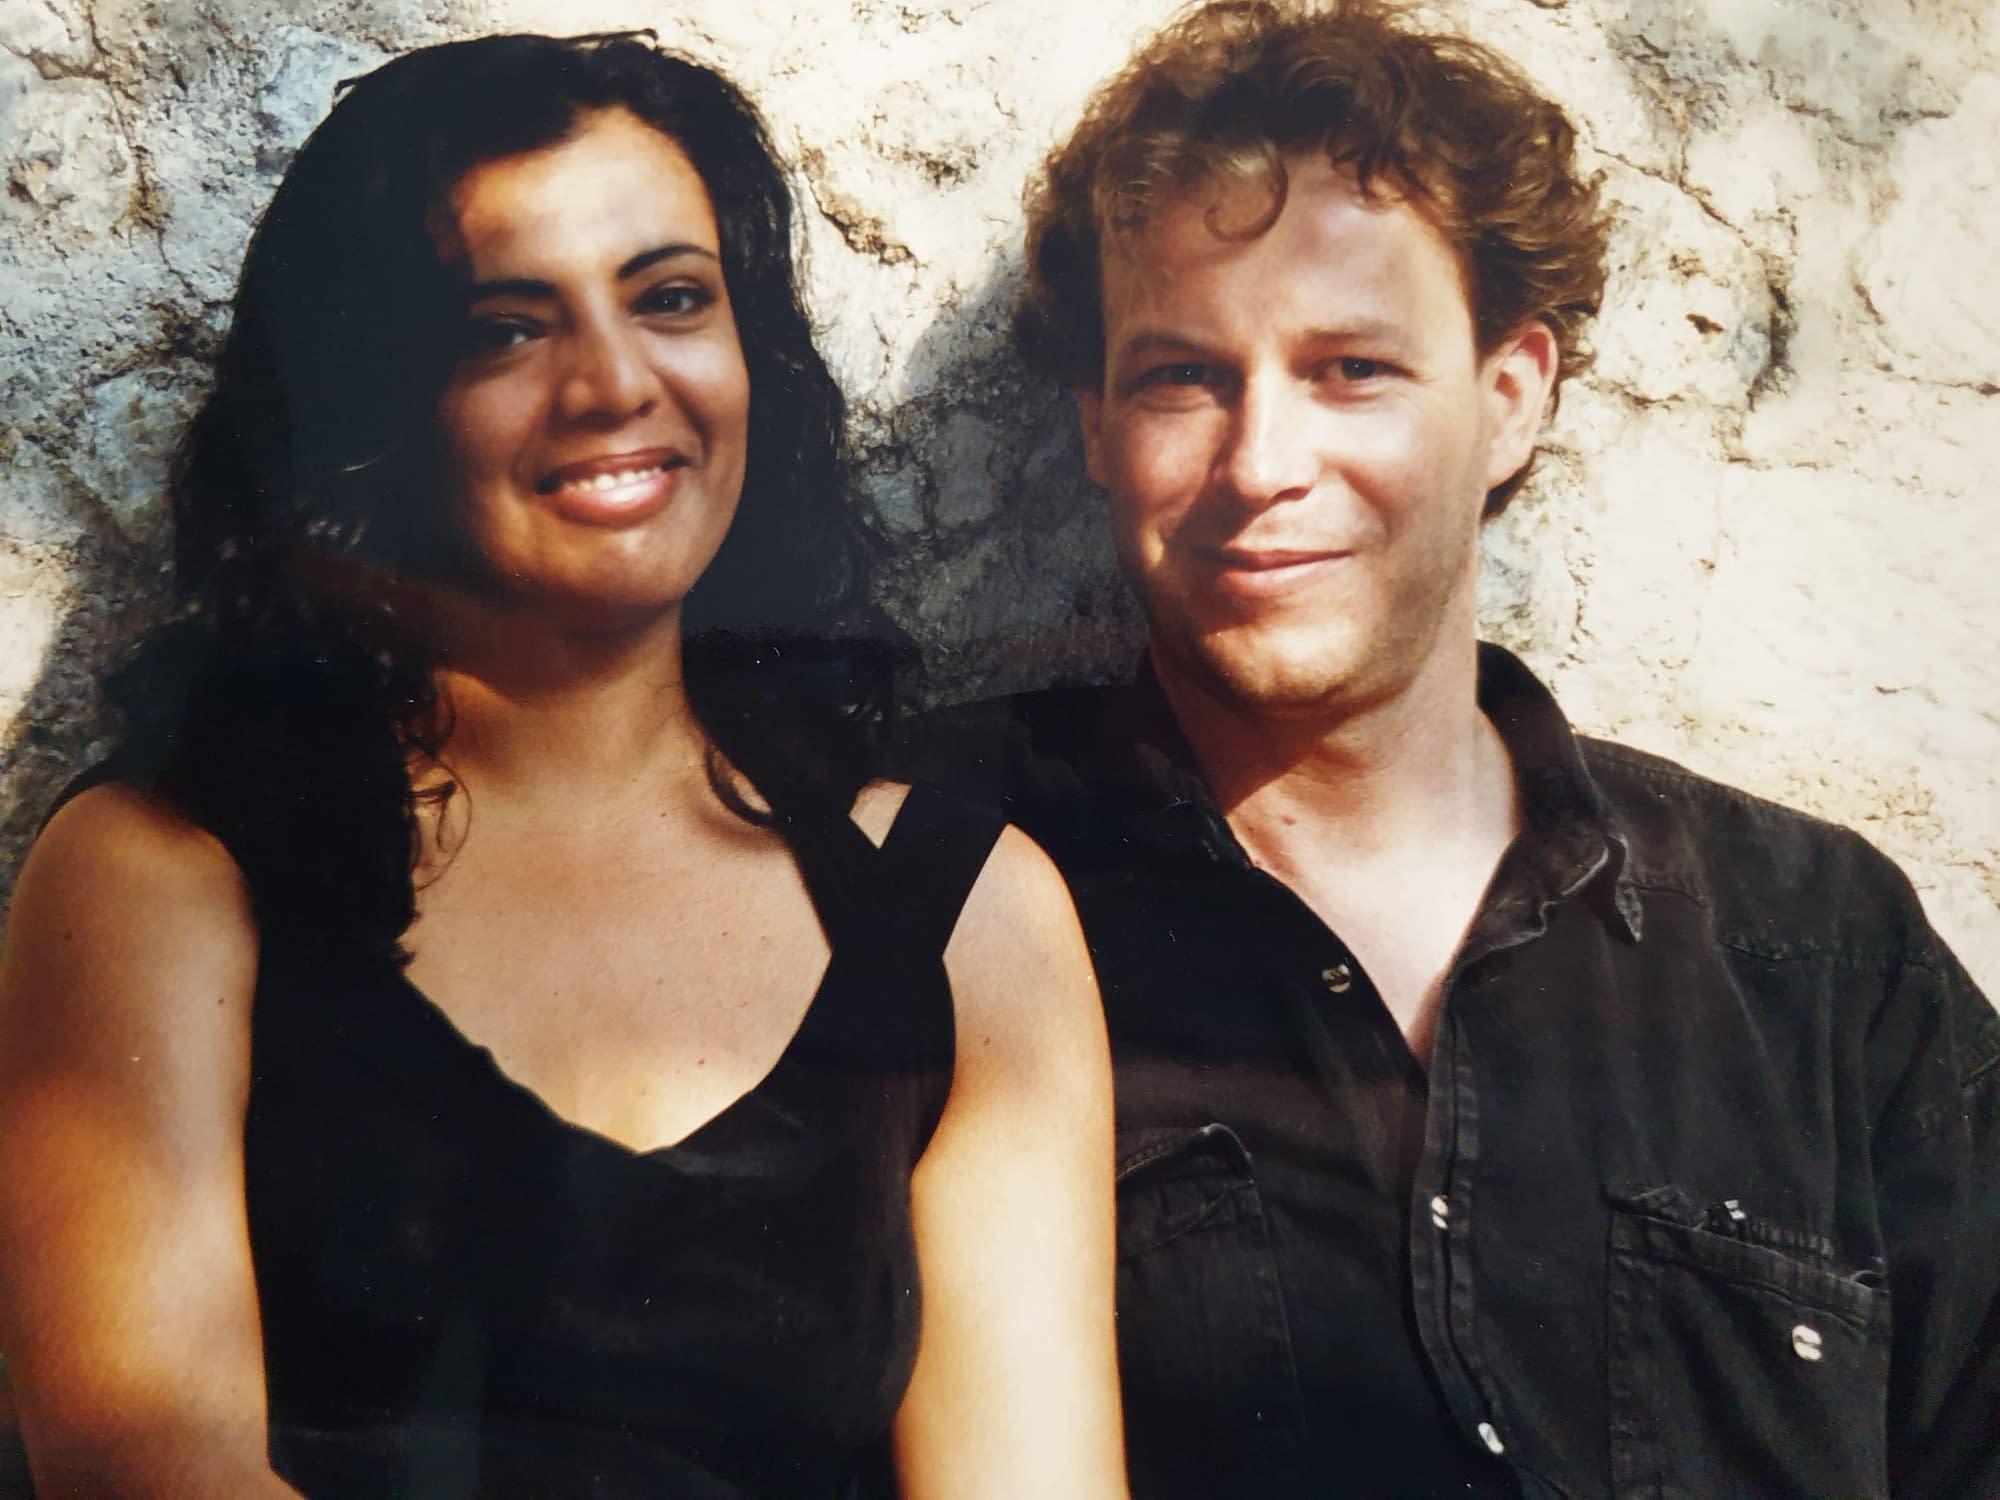 Peter and Galitta